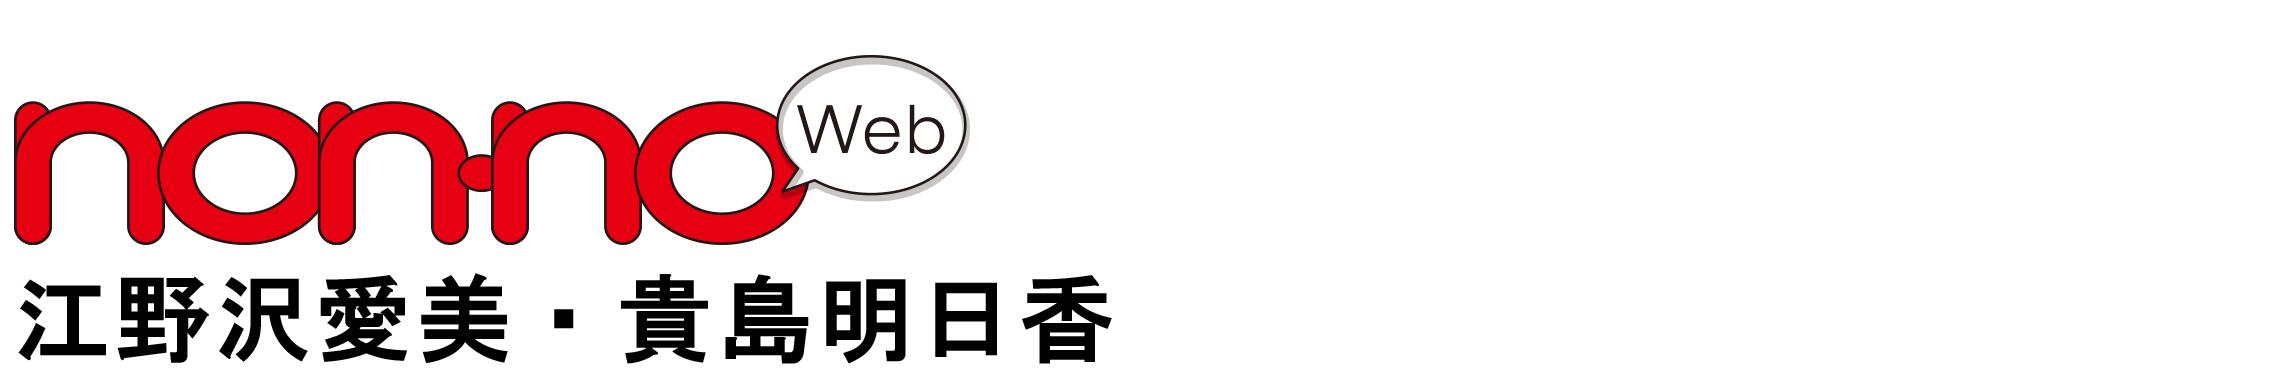 non-no WEB 江野沢愛美・貴島明日香